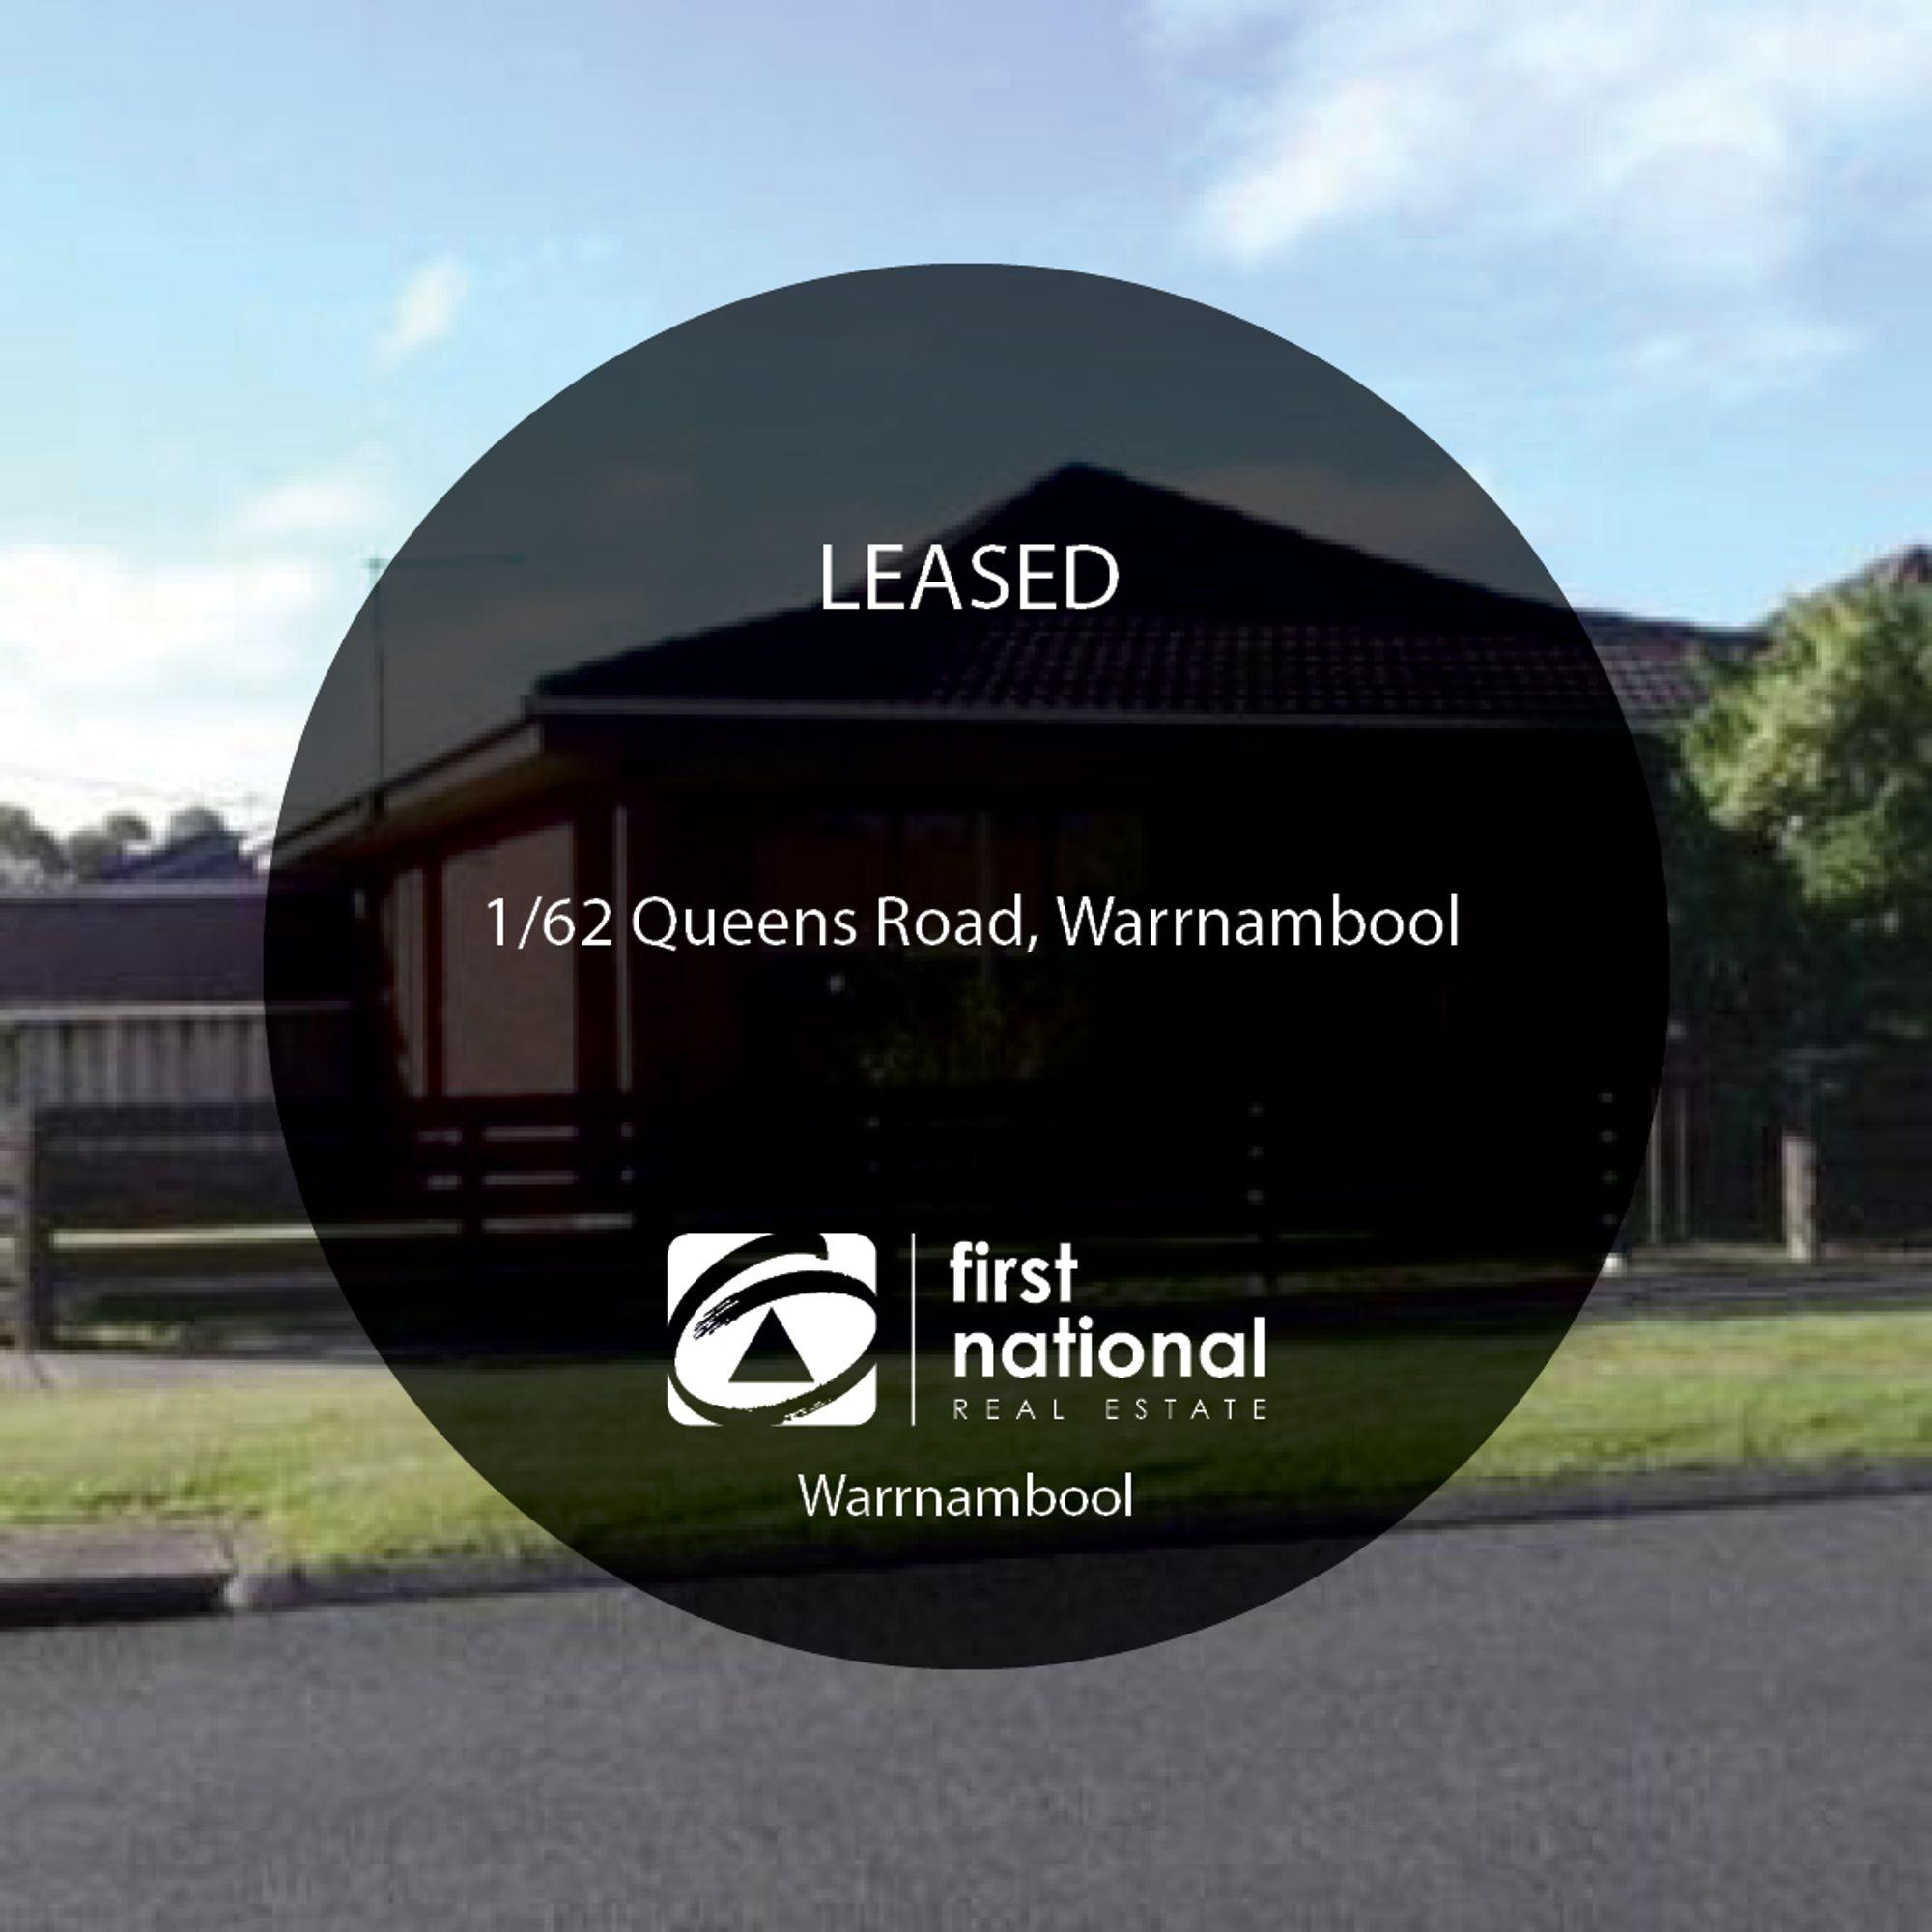 1/62 Queens Road, Warrnambool, VIC 3280